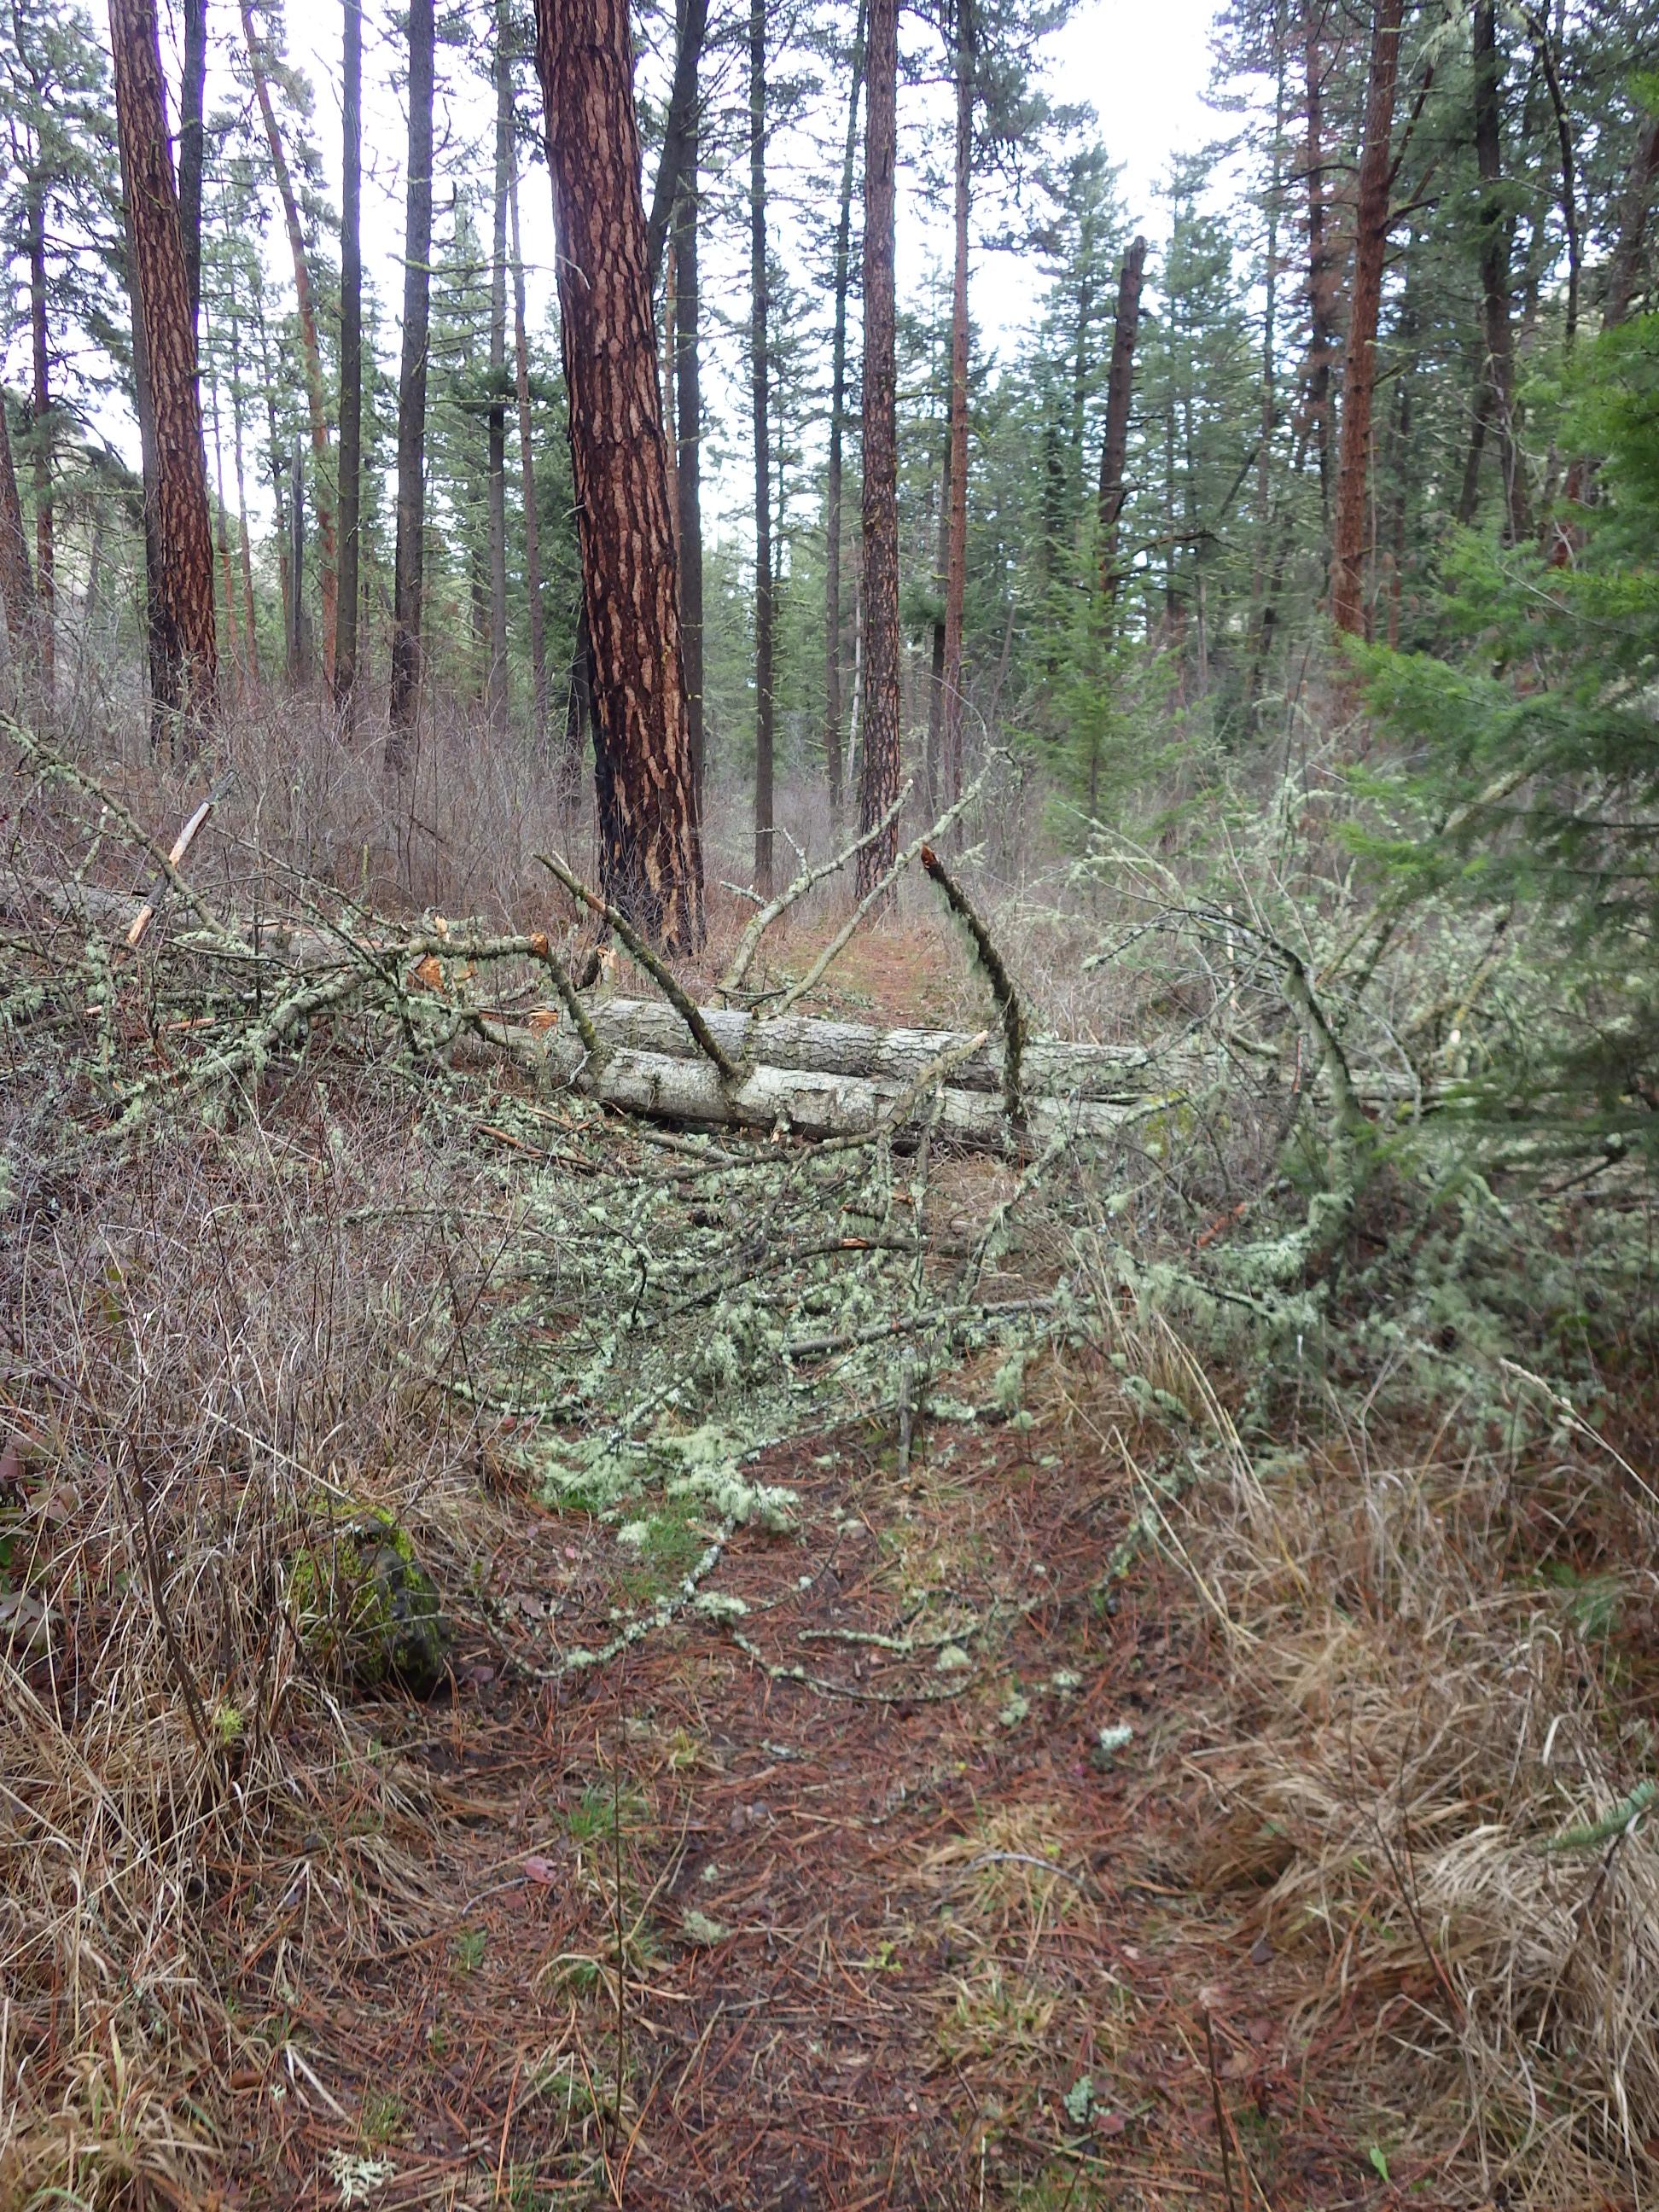 Trail hurdle. Lots of deadfall up-trail